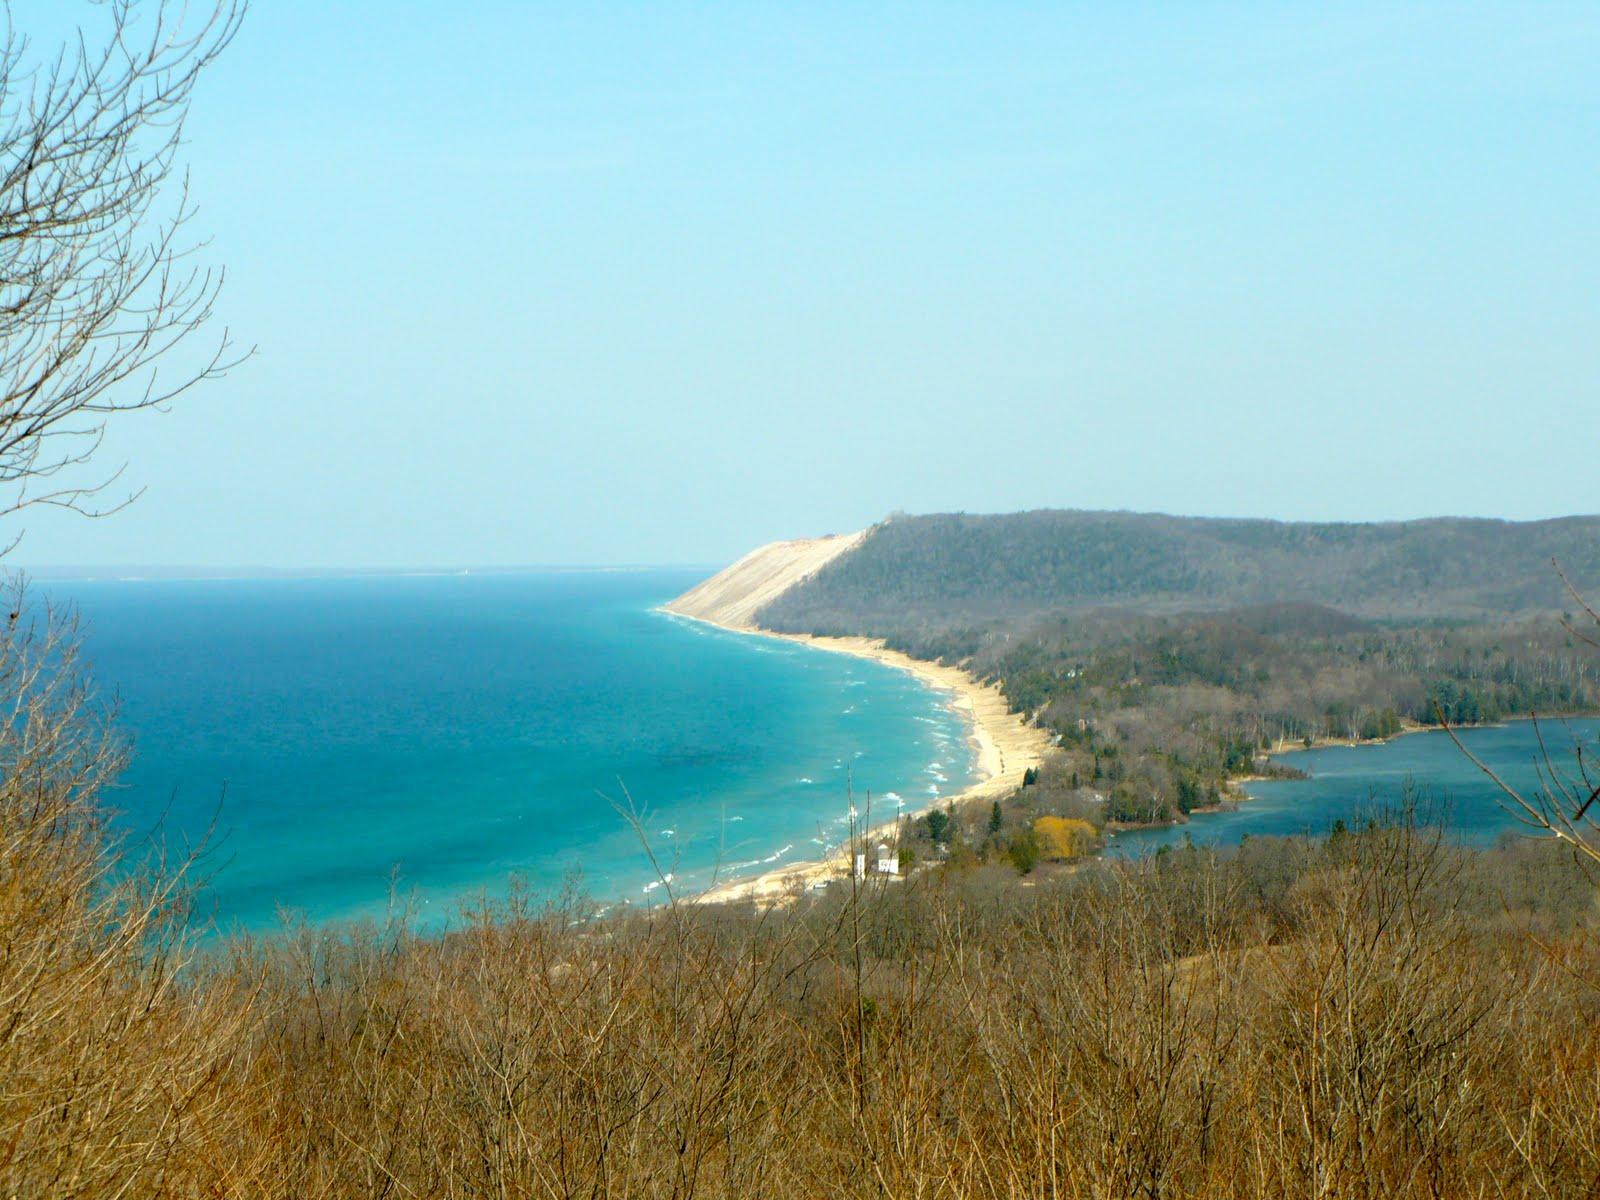 Sleeping Bear Dunes National Lakeshore: Visit #1 - Katey Schultz